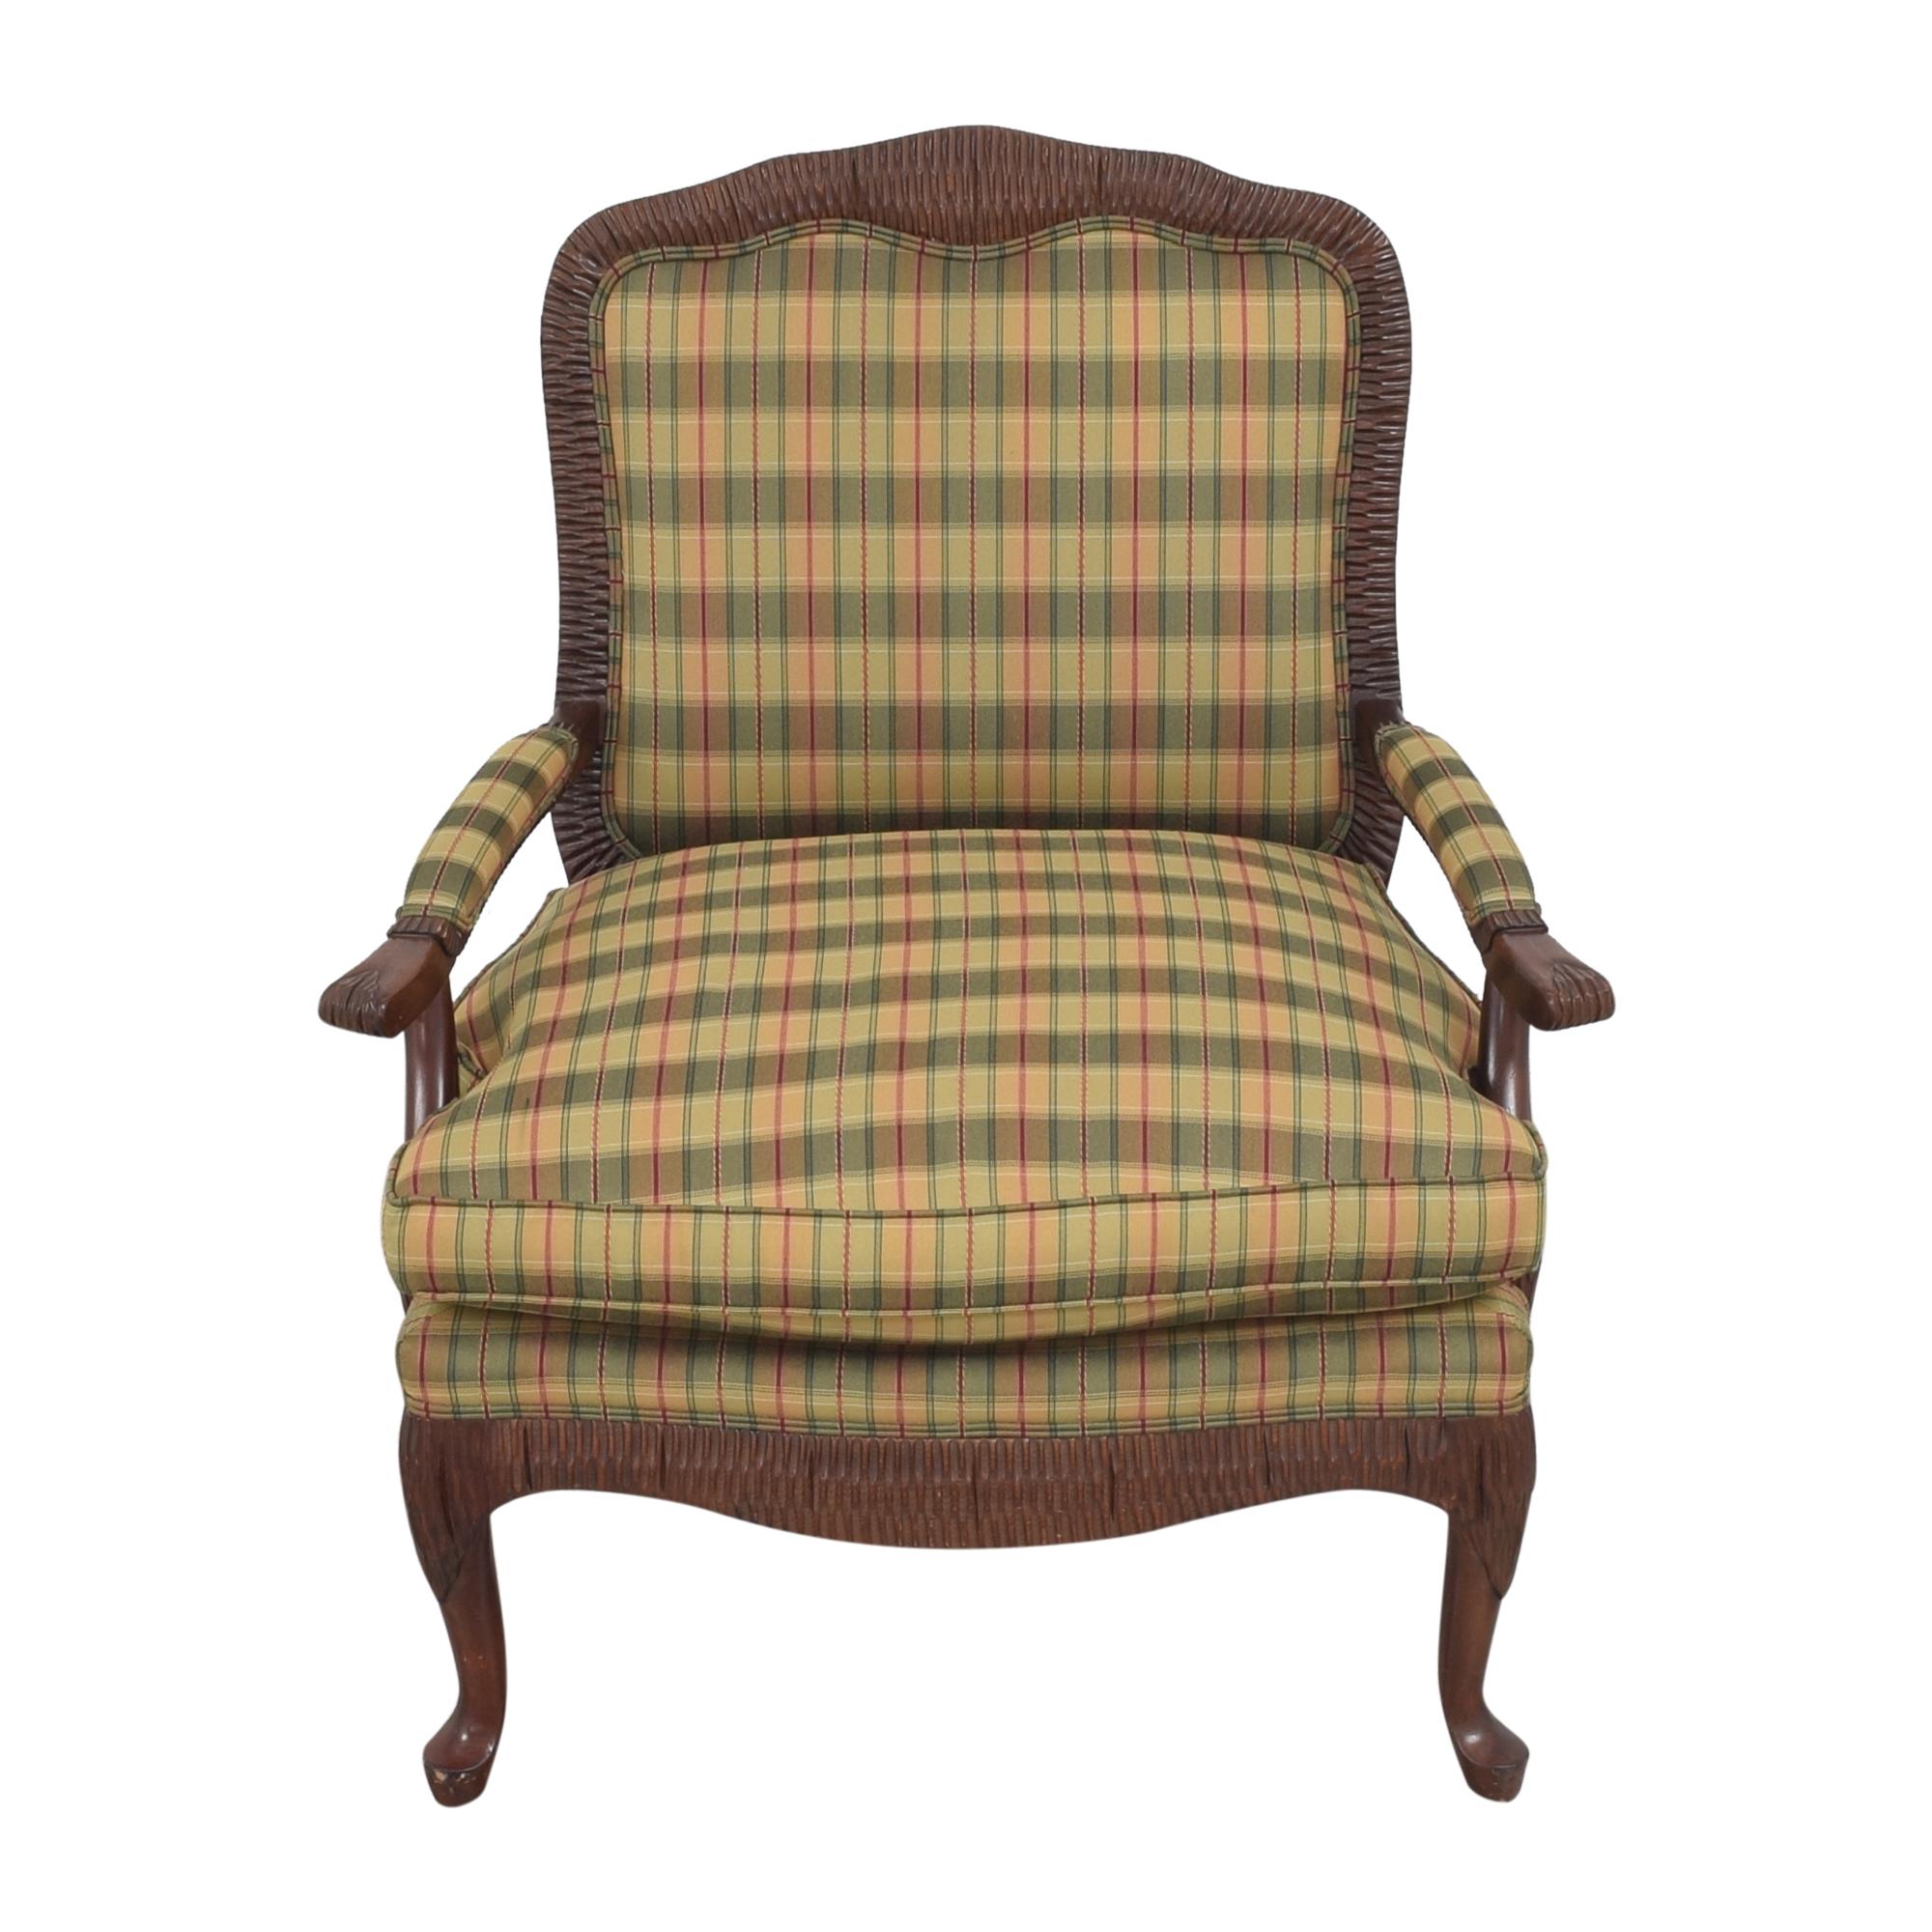 Lexington Furniture Lexington Furniture Upholstered Accent Chair ct